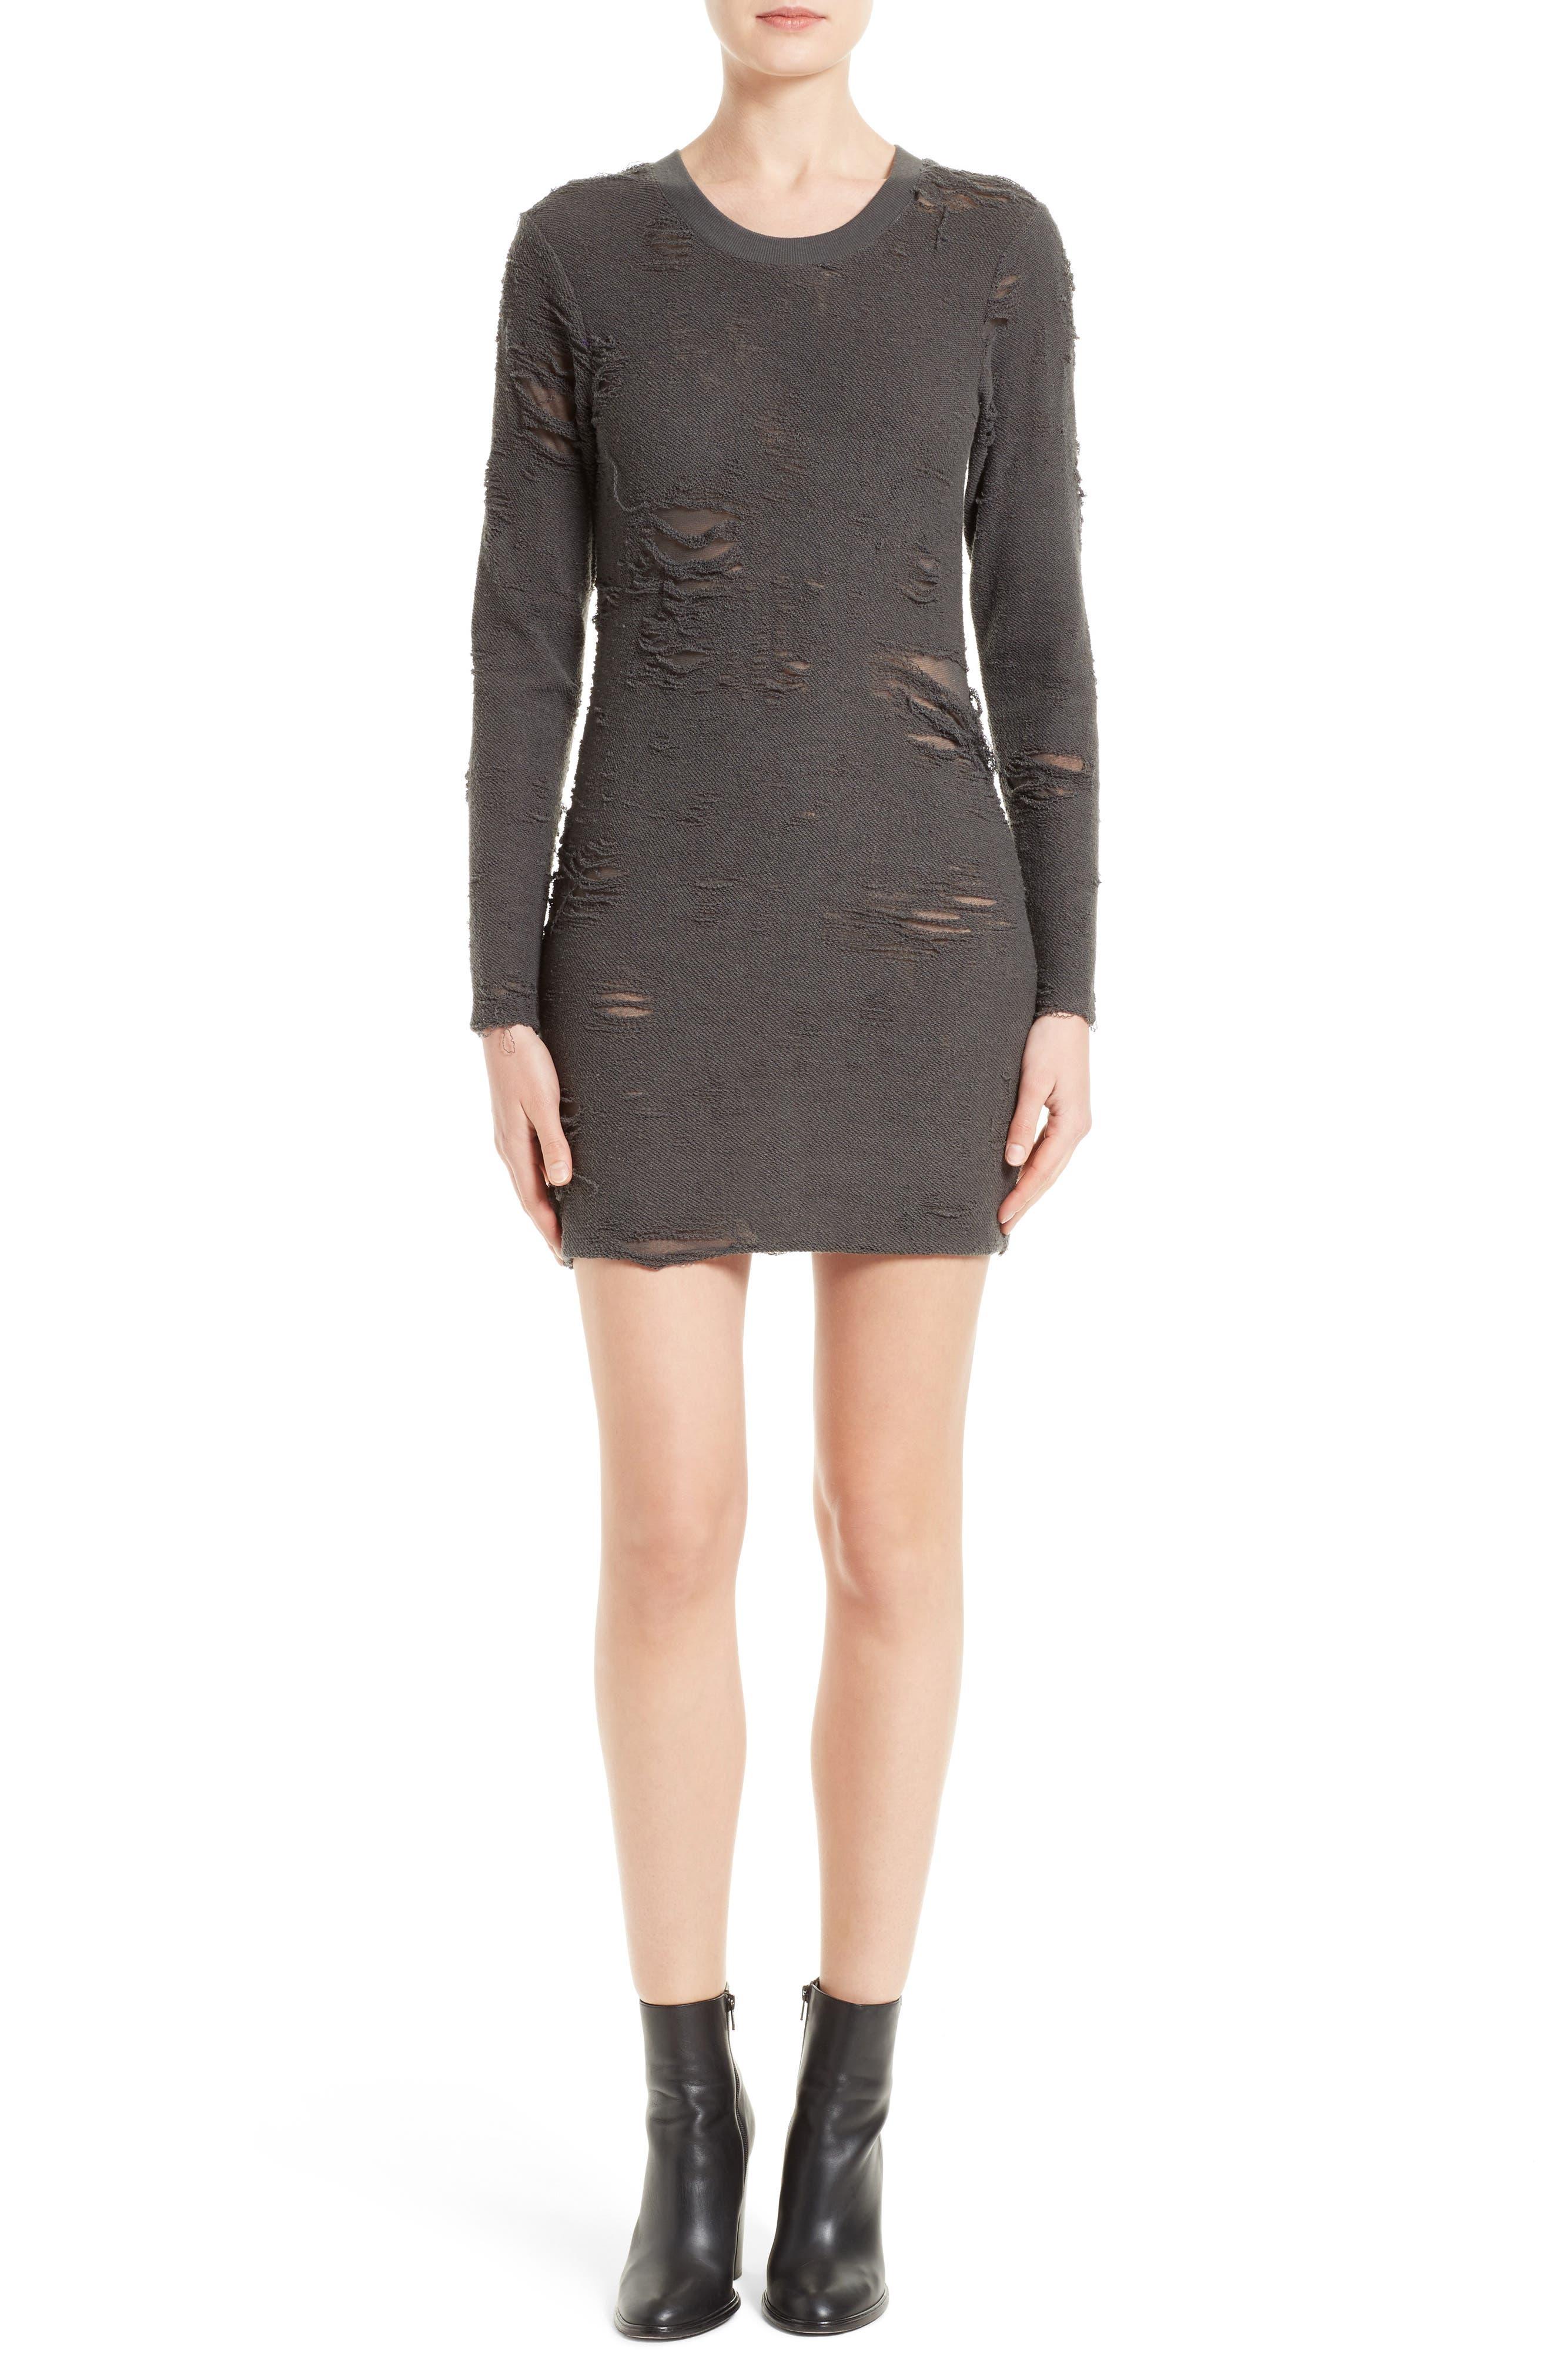 Cevoc Distressed Dress,                         Main,                         color, 029